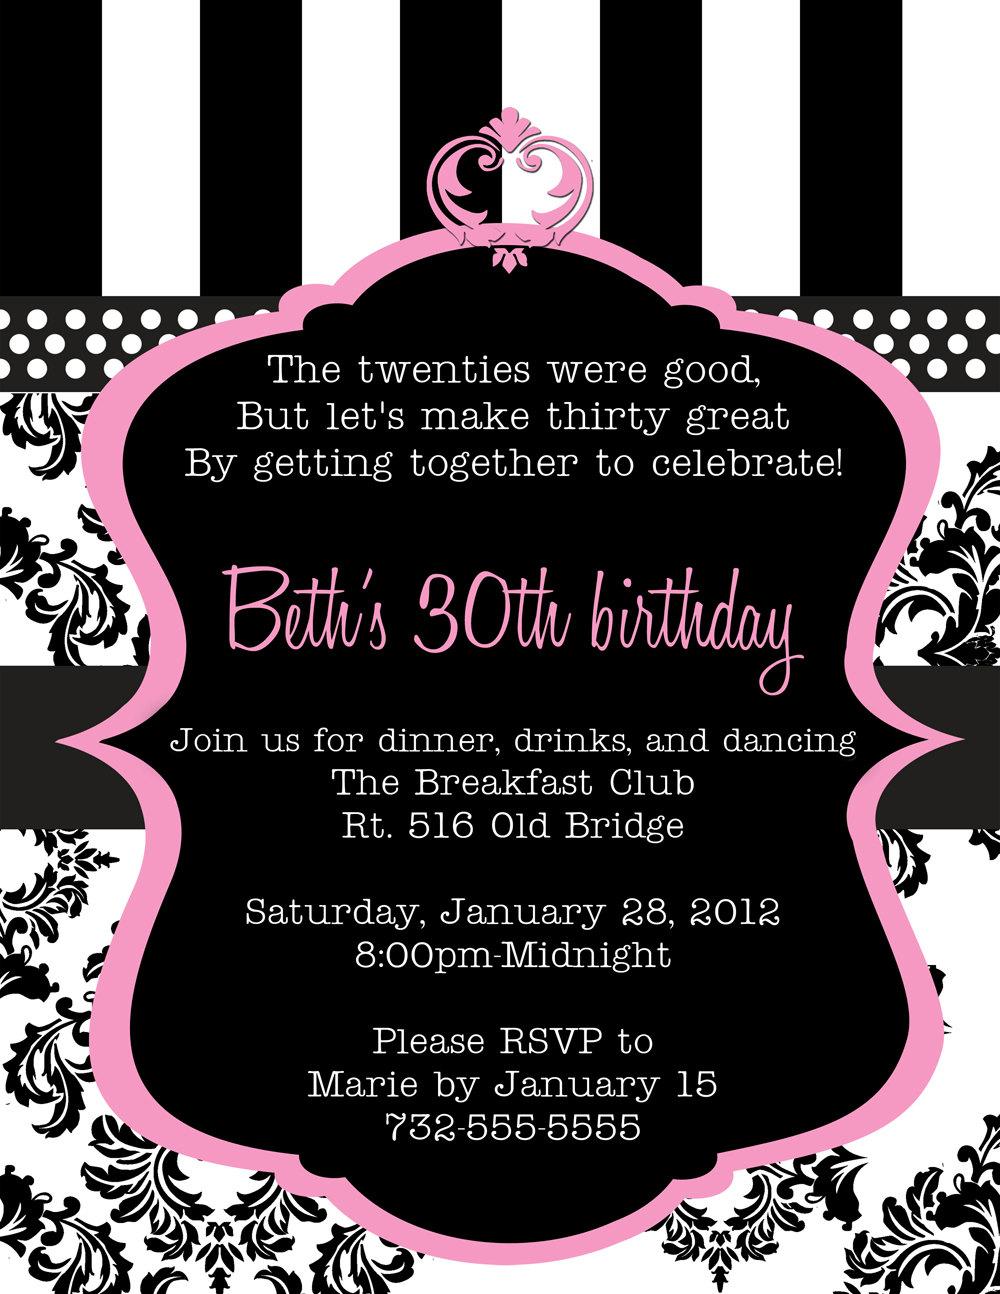 Birthday Invite Template Free